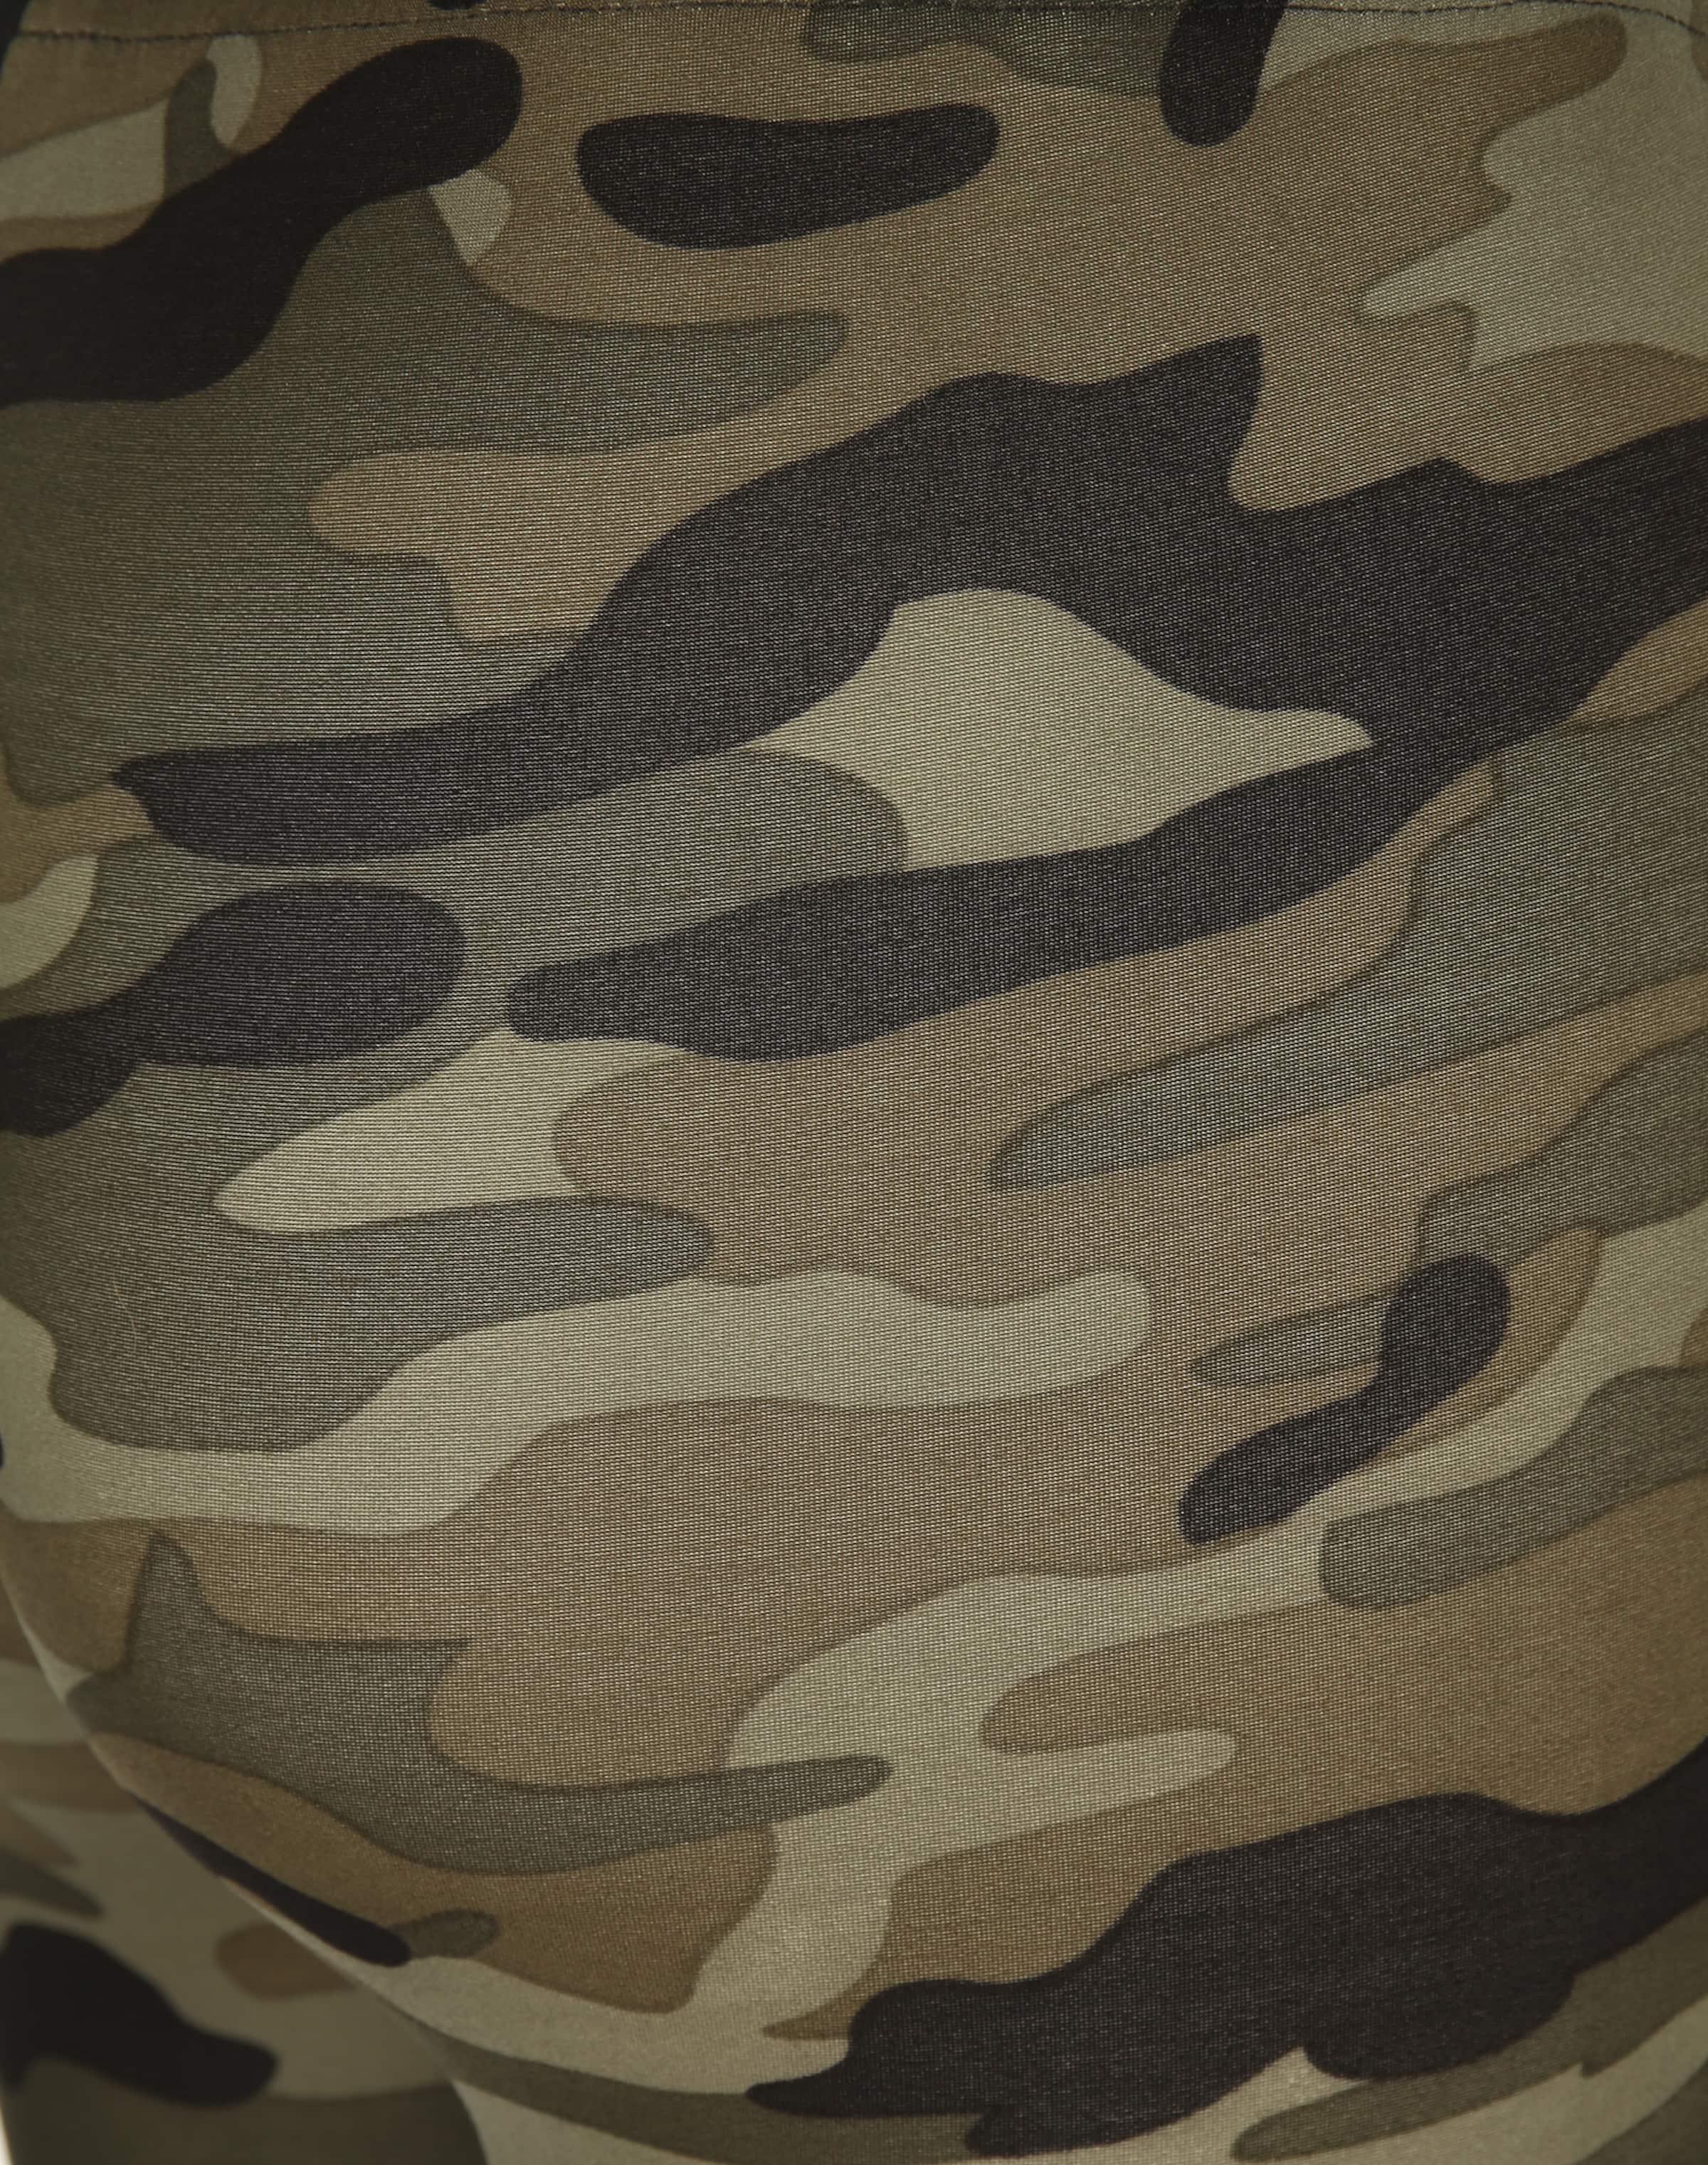 Camouflage Khaki Classics In Urban leggings rdxeCoQBW